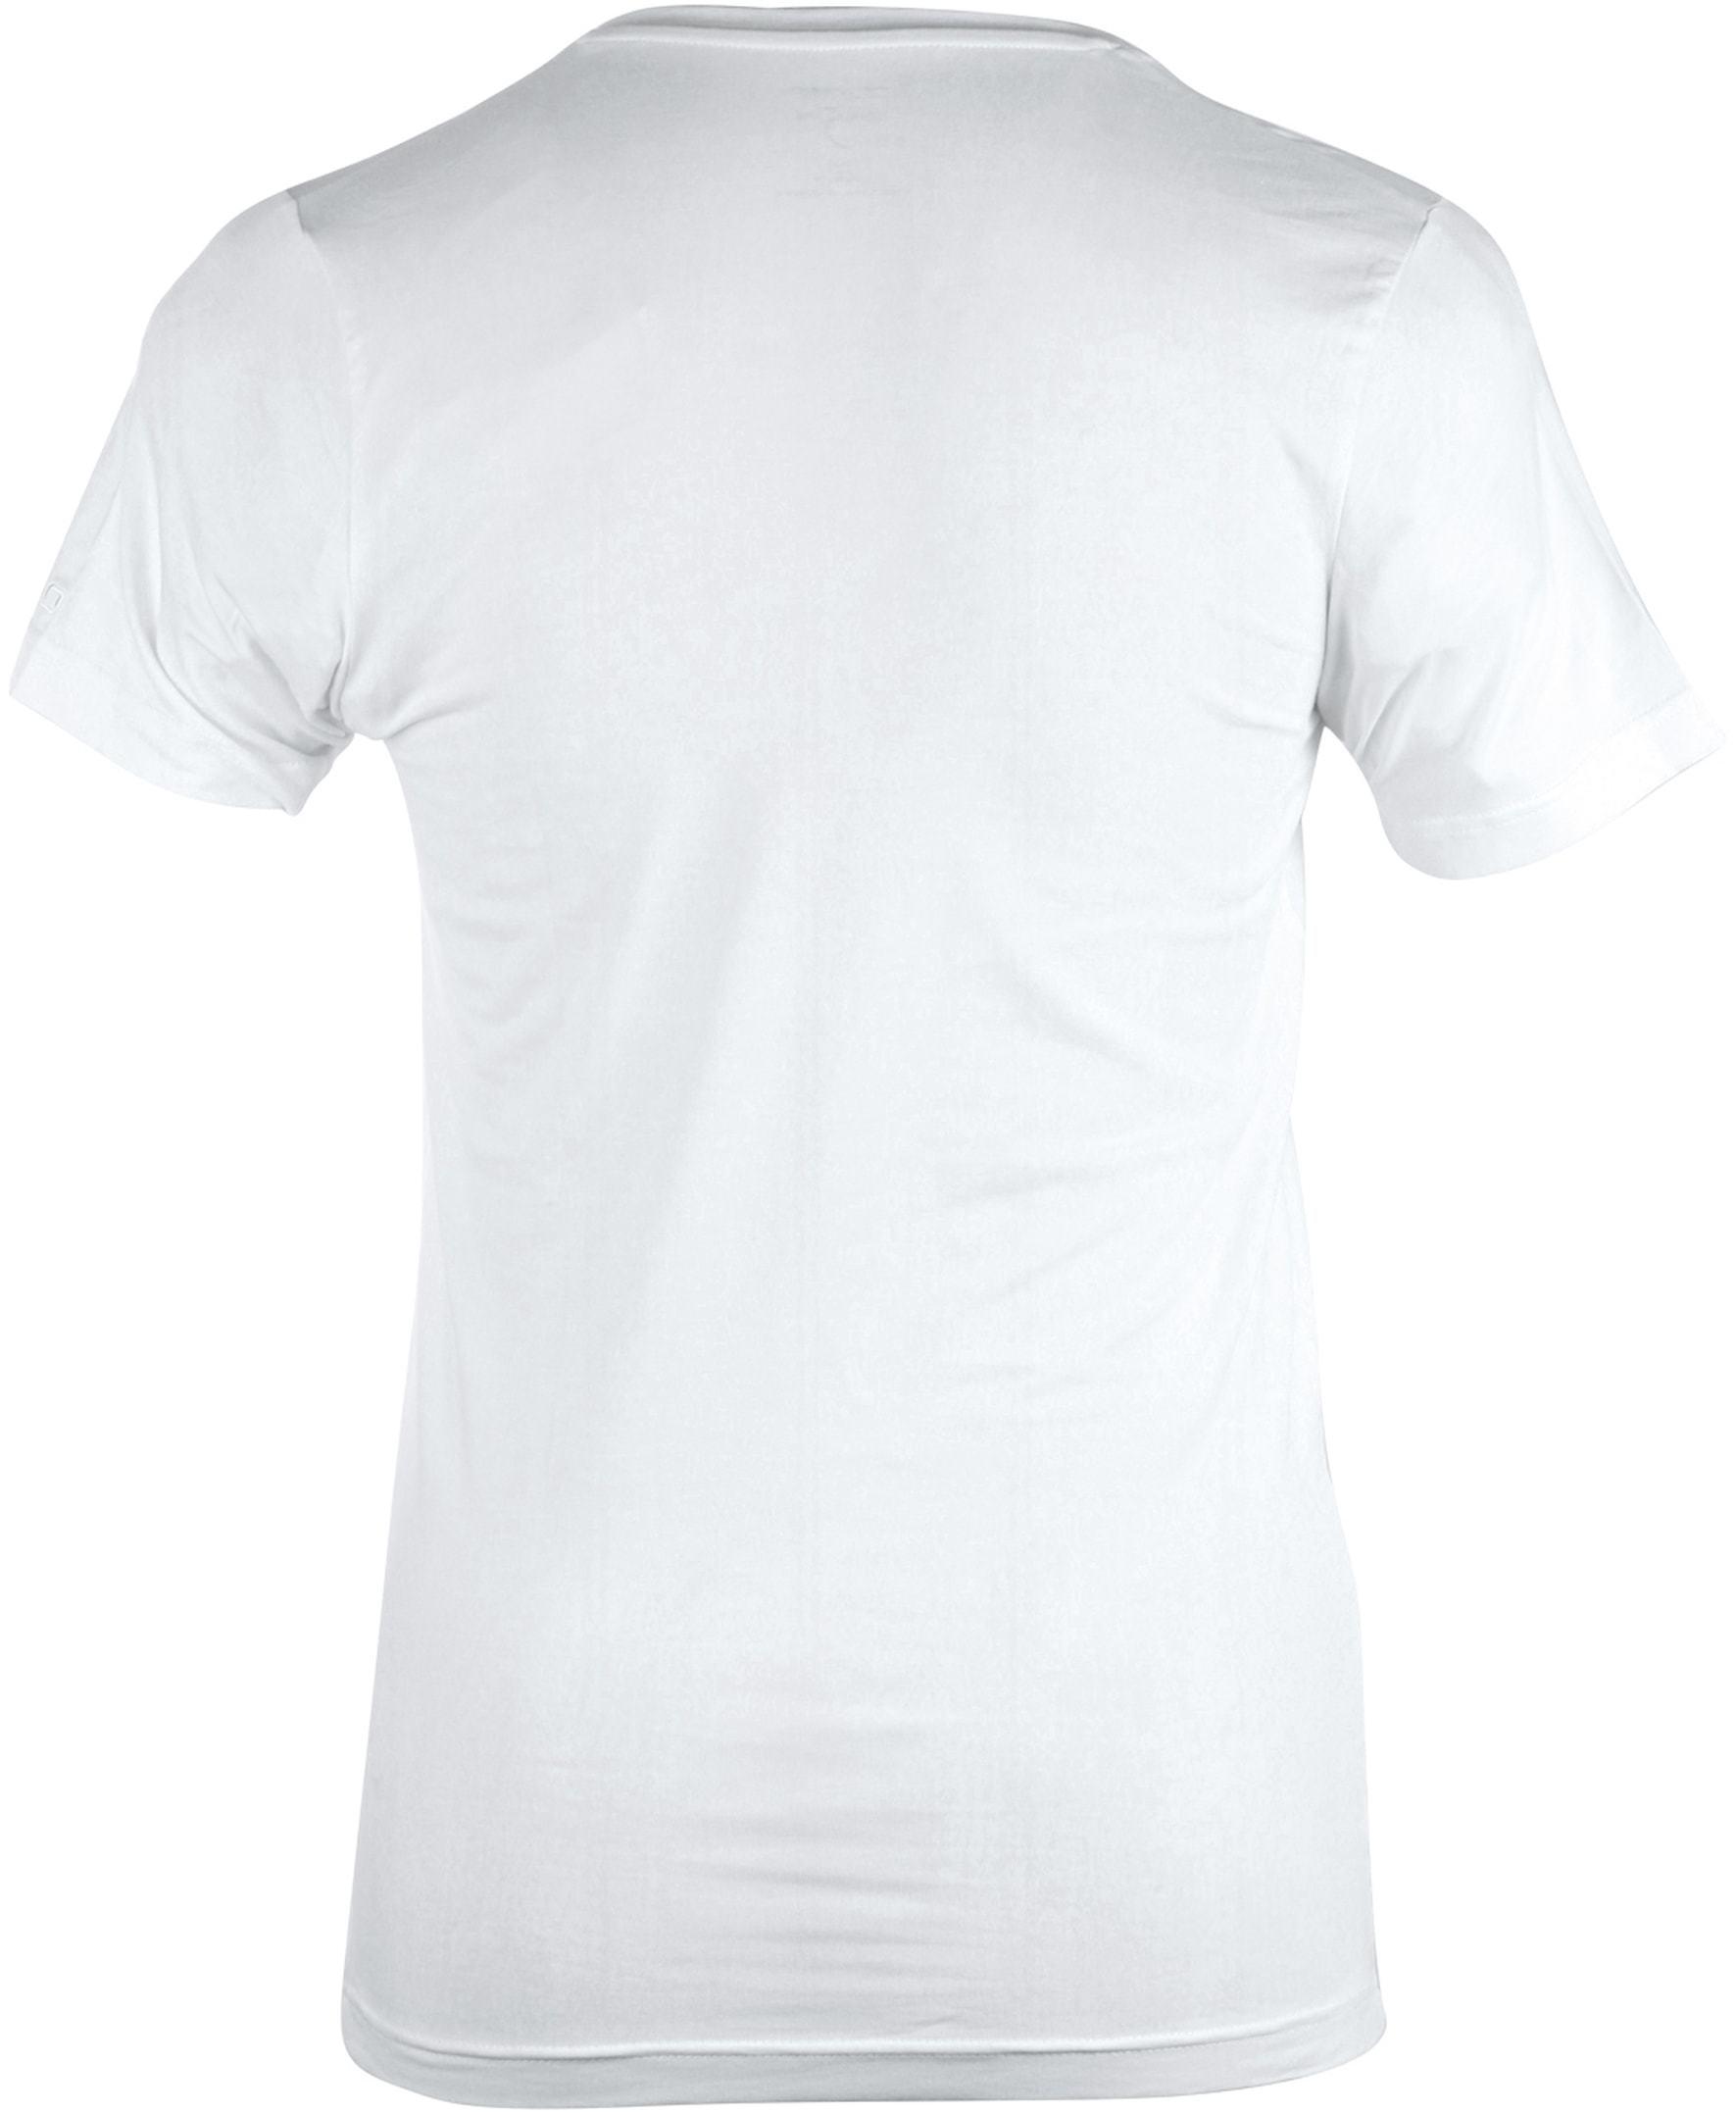 OLYMP T-Shirt Diepe V-Hals Stretch foto 1